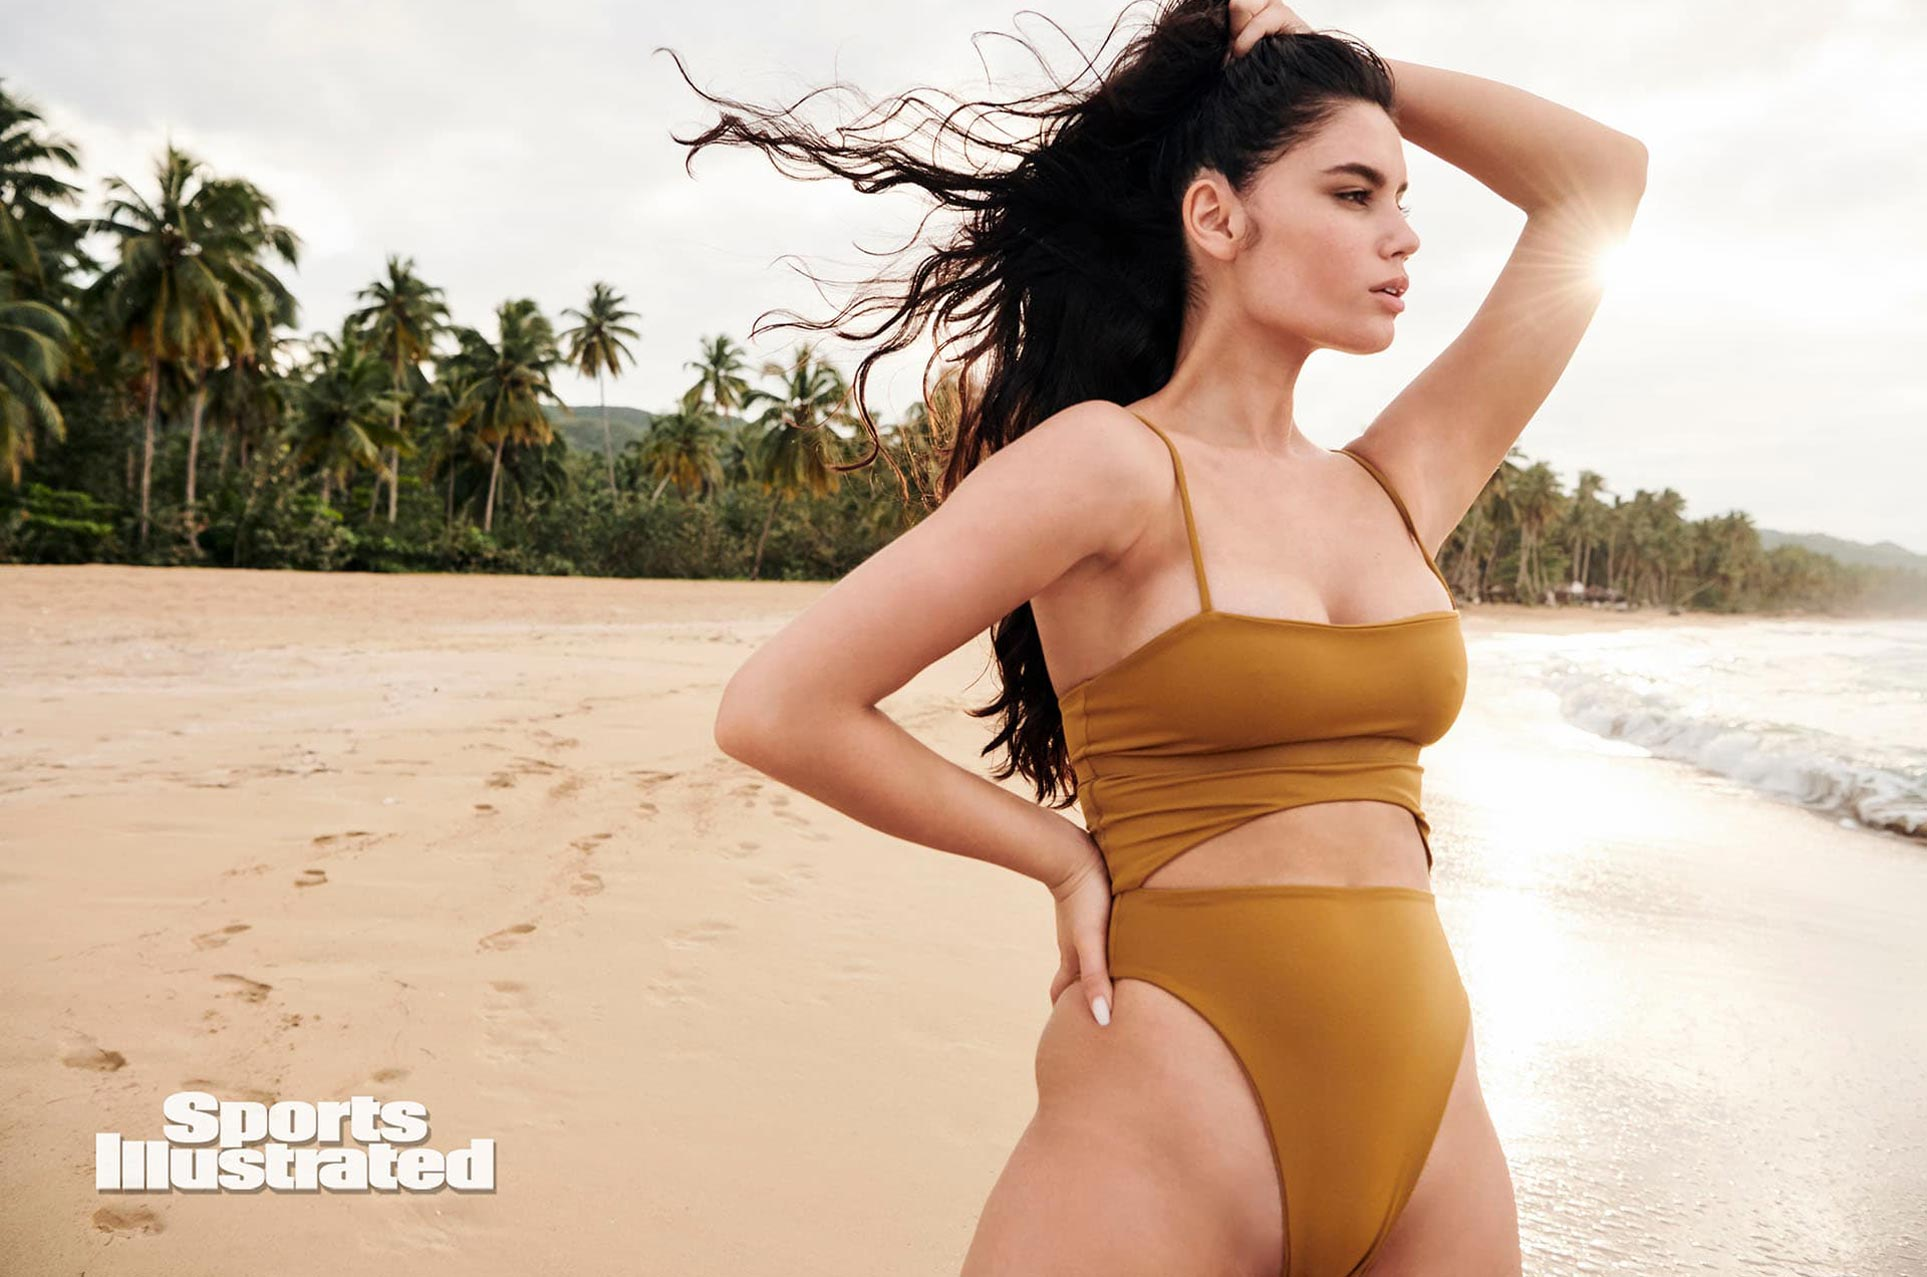 Энн де Паула в каталоге купальников Sports Illustrated Swimsuit 2020 / фото 16